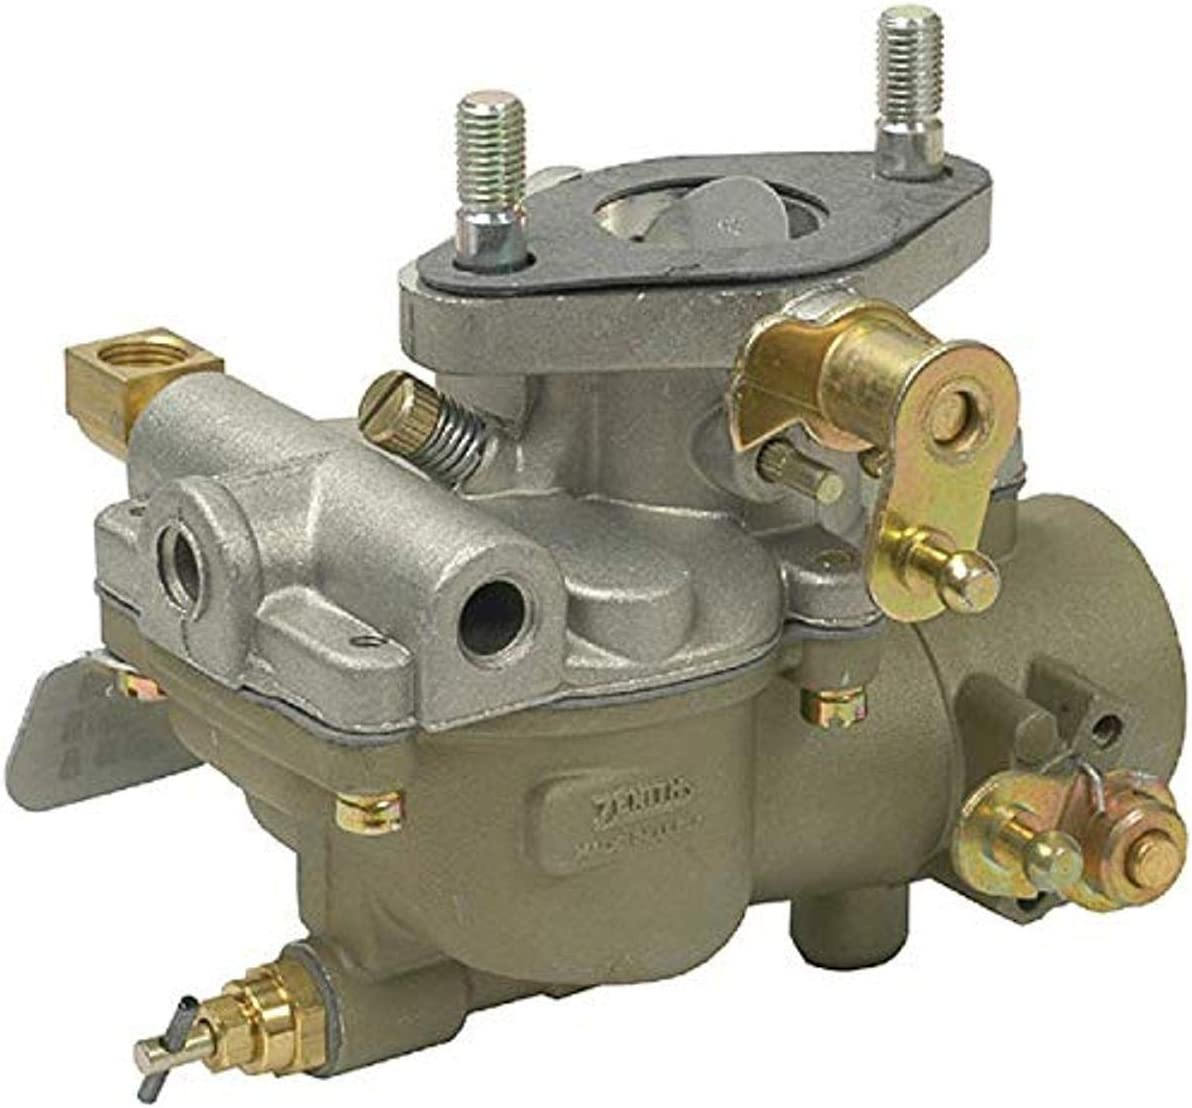 DB Electrical New Max 85% OFF Max 53% OFF Zenith Fuel Updraft System Gasol Carburetor